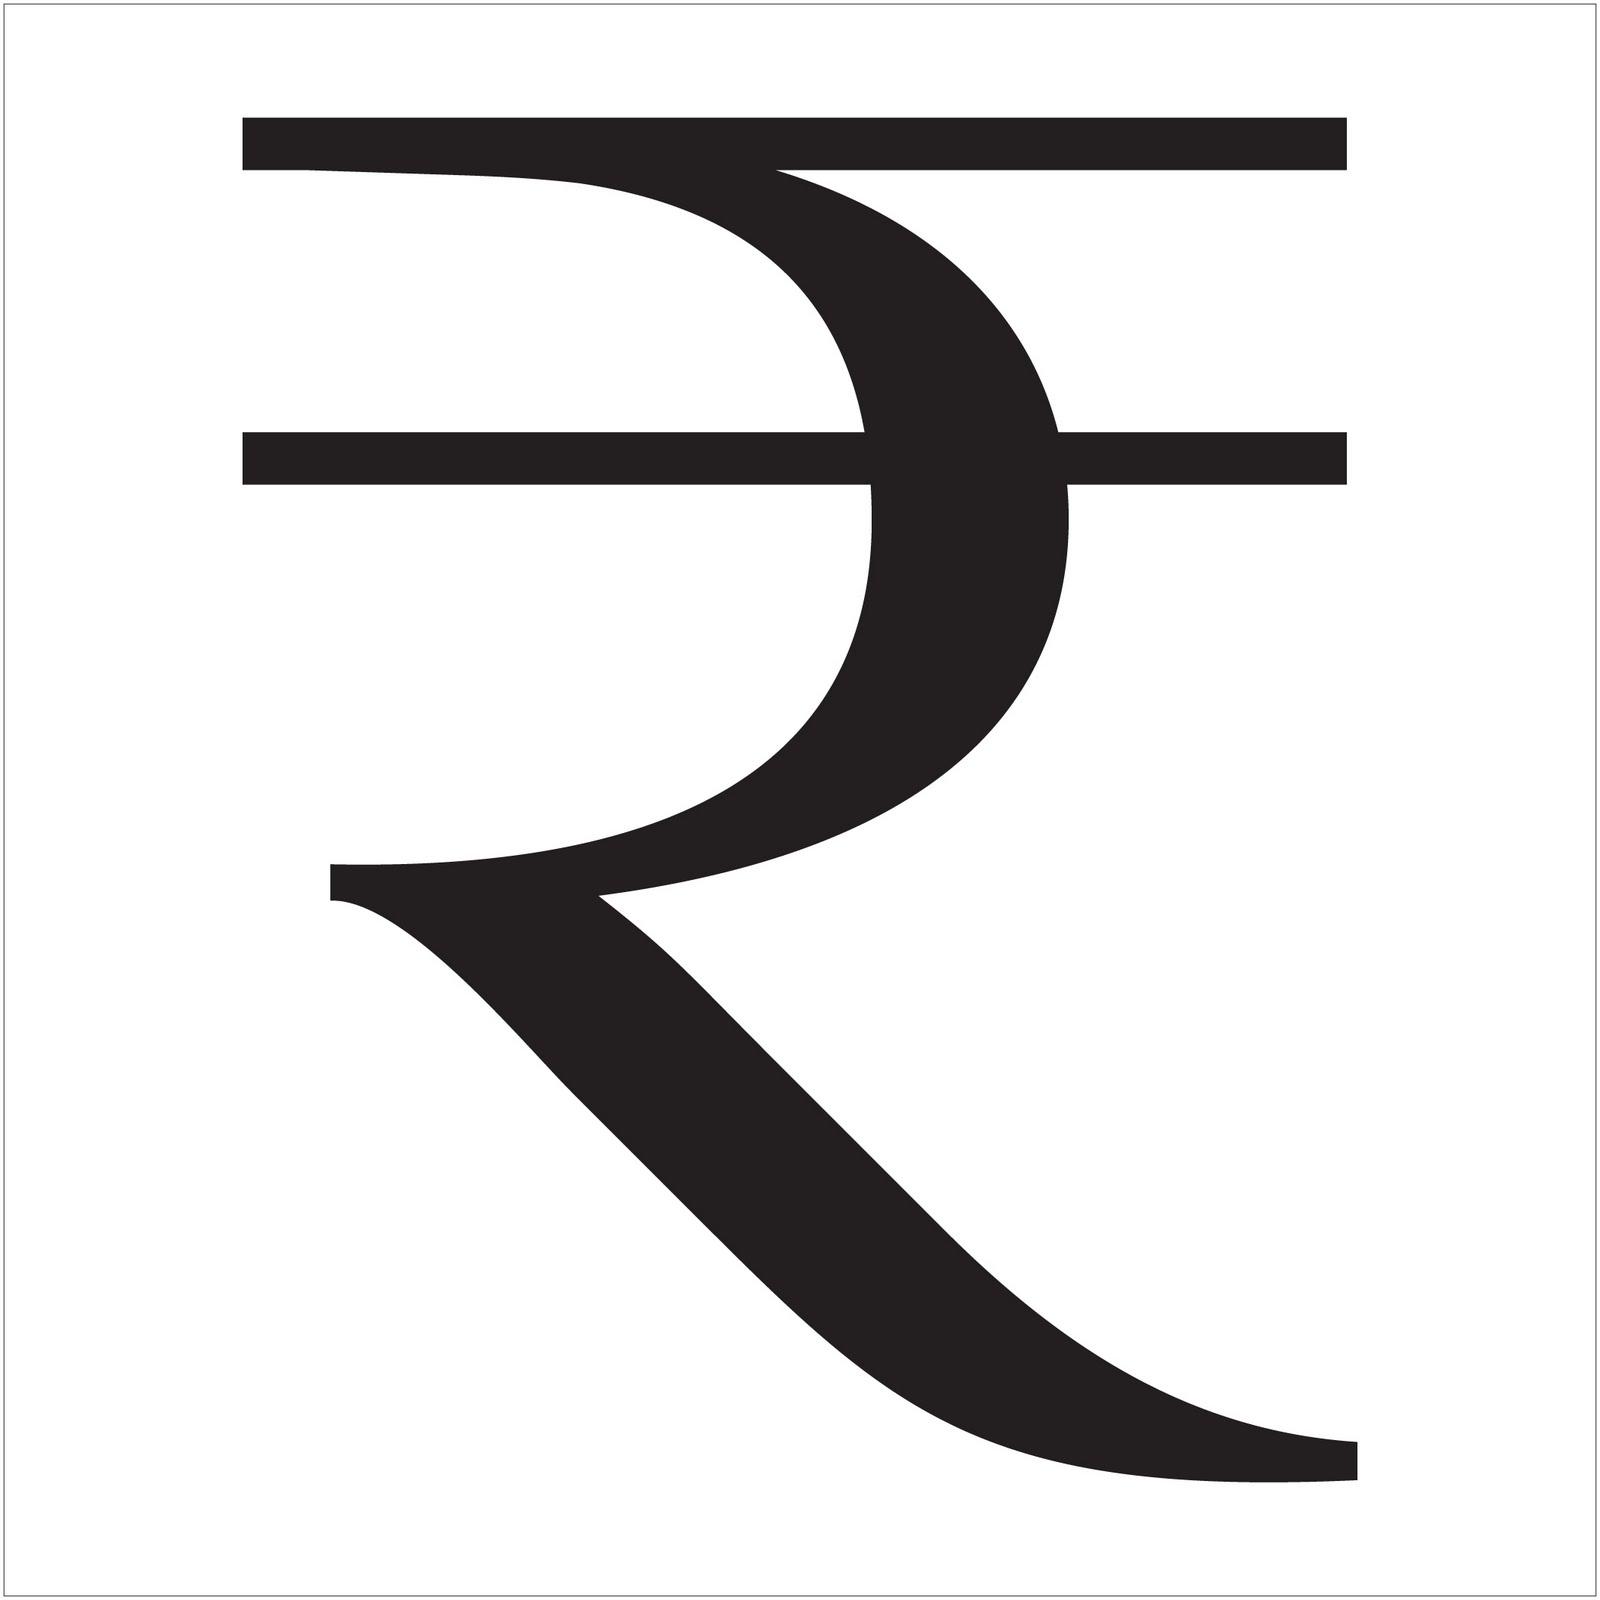 Fun with letterforms customization of rupee symbol buycottarizona